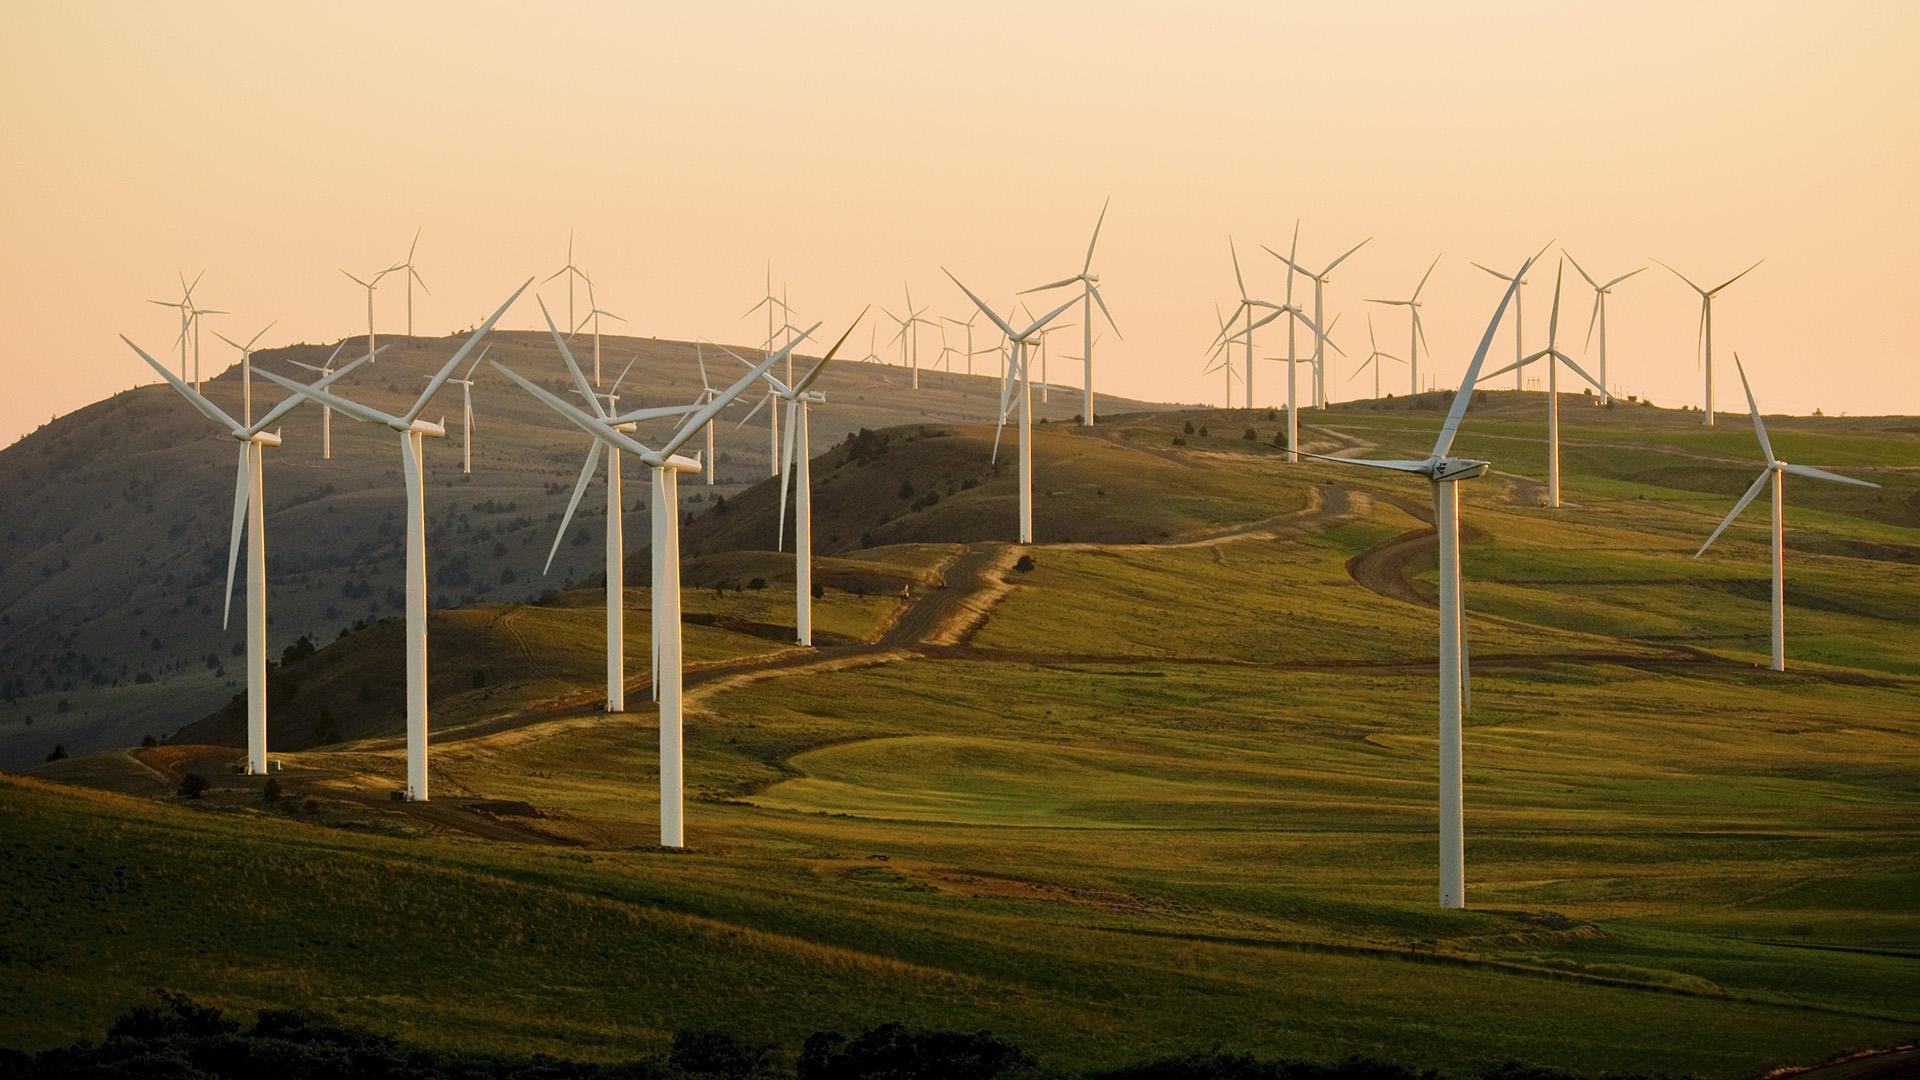 Australia's Resources Minister To Explain Wind Farm Funding Veto